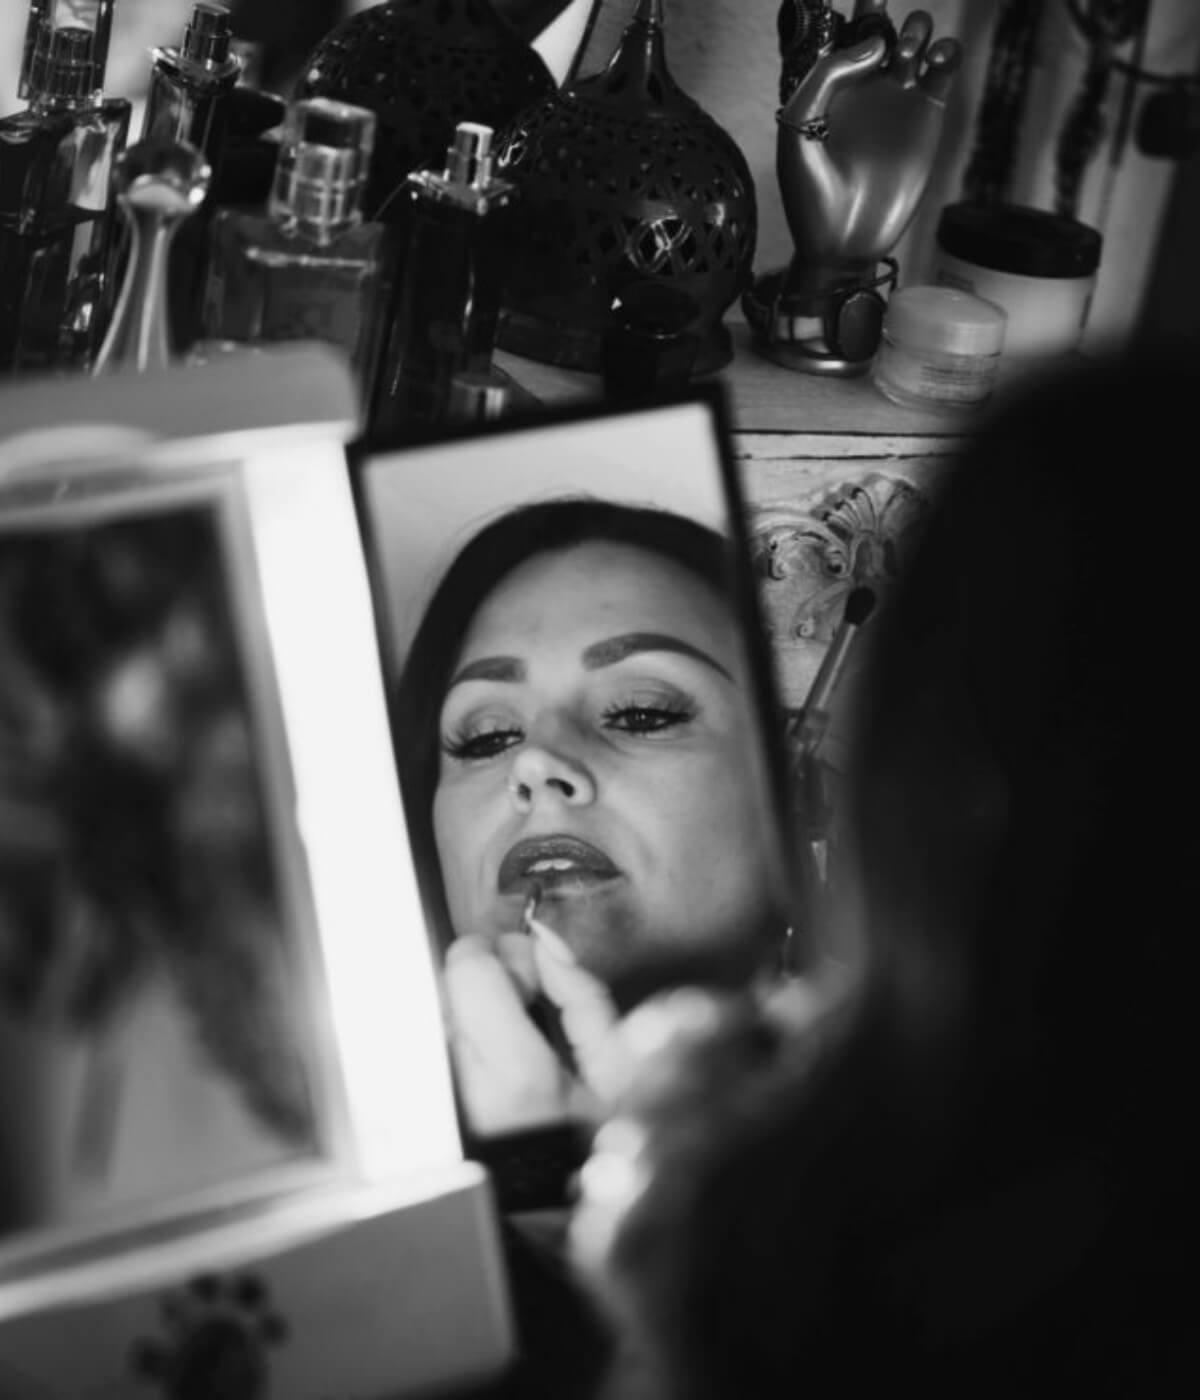 100 Years of Makeup Trends